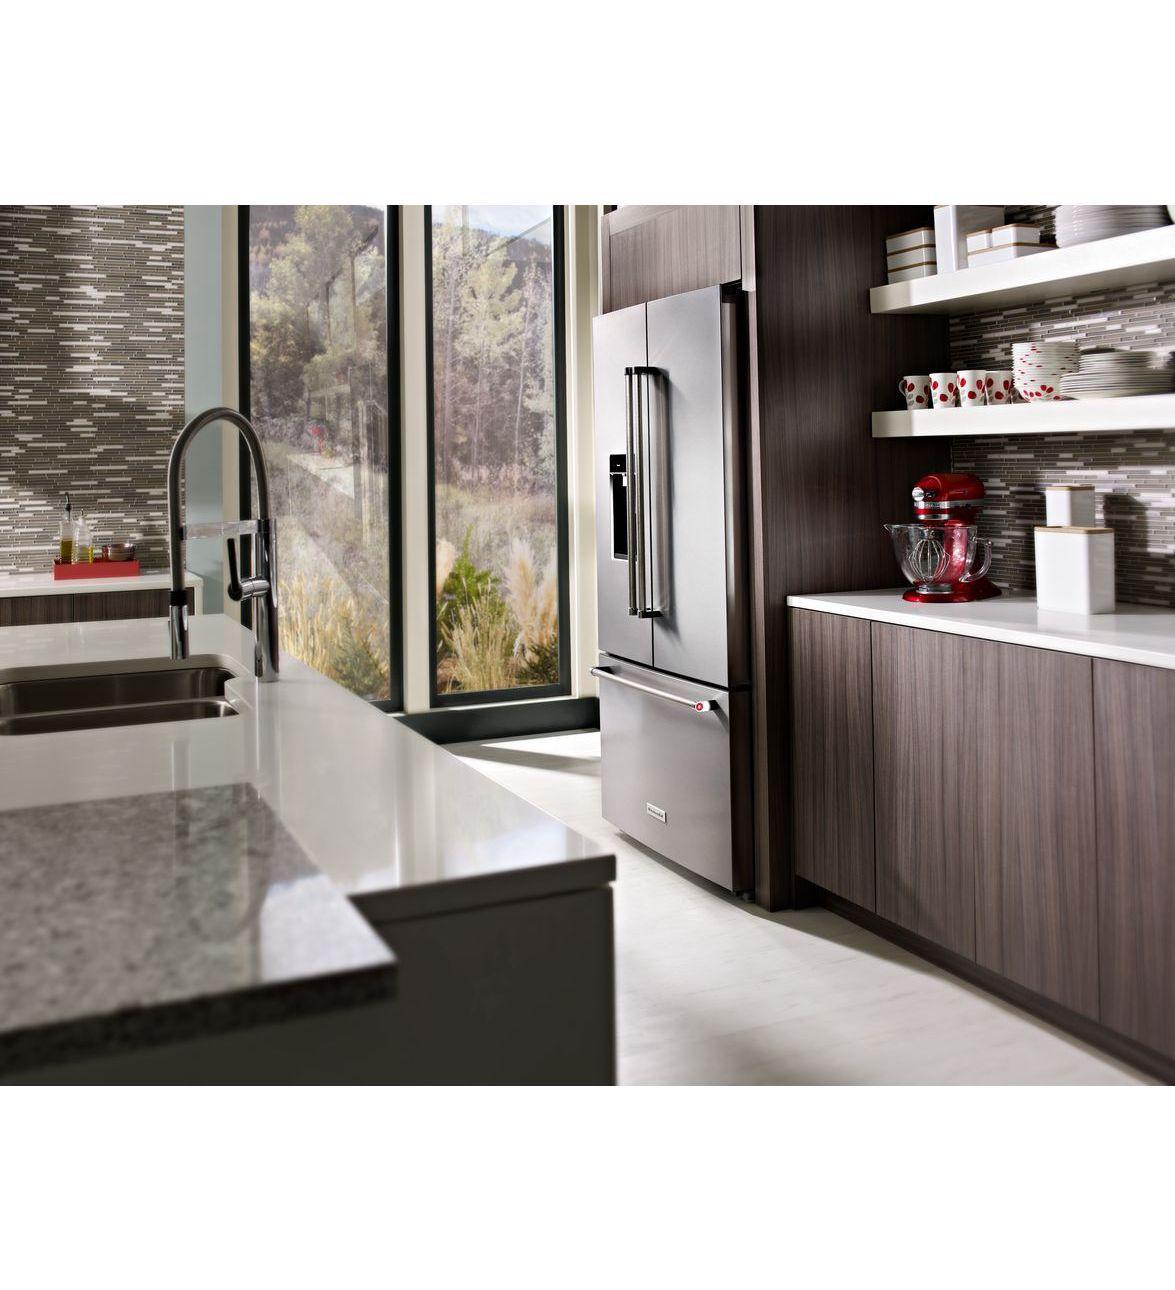 Kitchenaid Krfc704fss 23 8 Cu Ft Counter Depth French